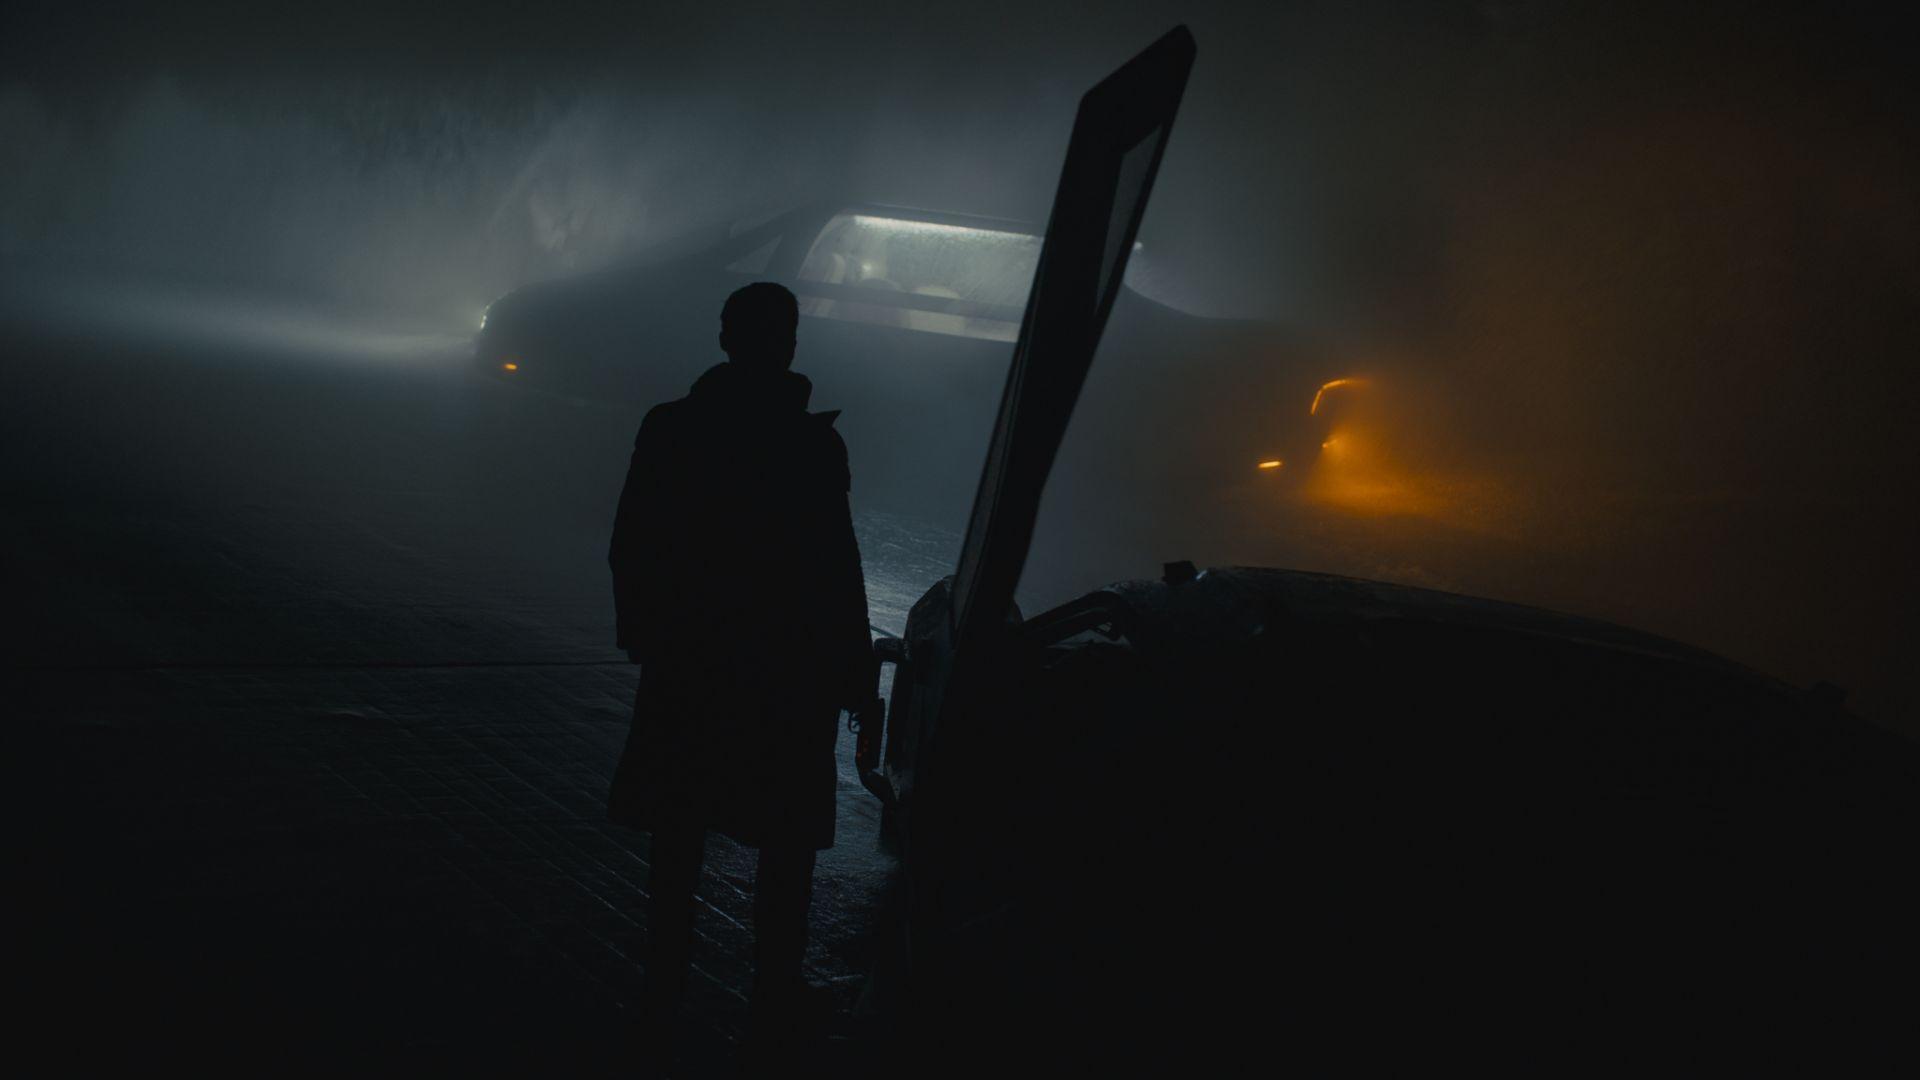 Wallpaper Blade runner 2049, ryan gosling, night, dark